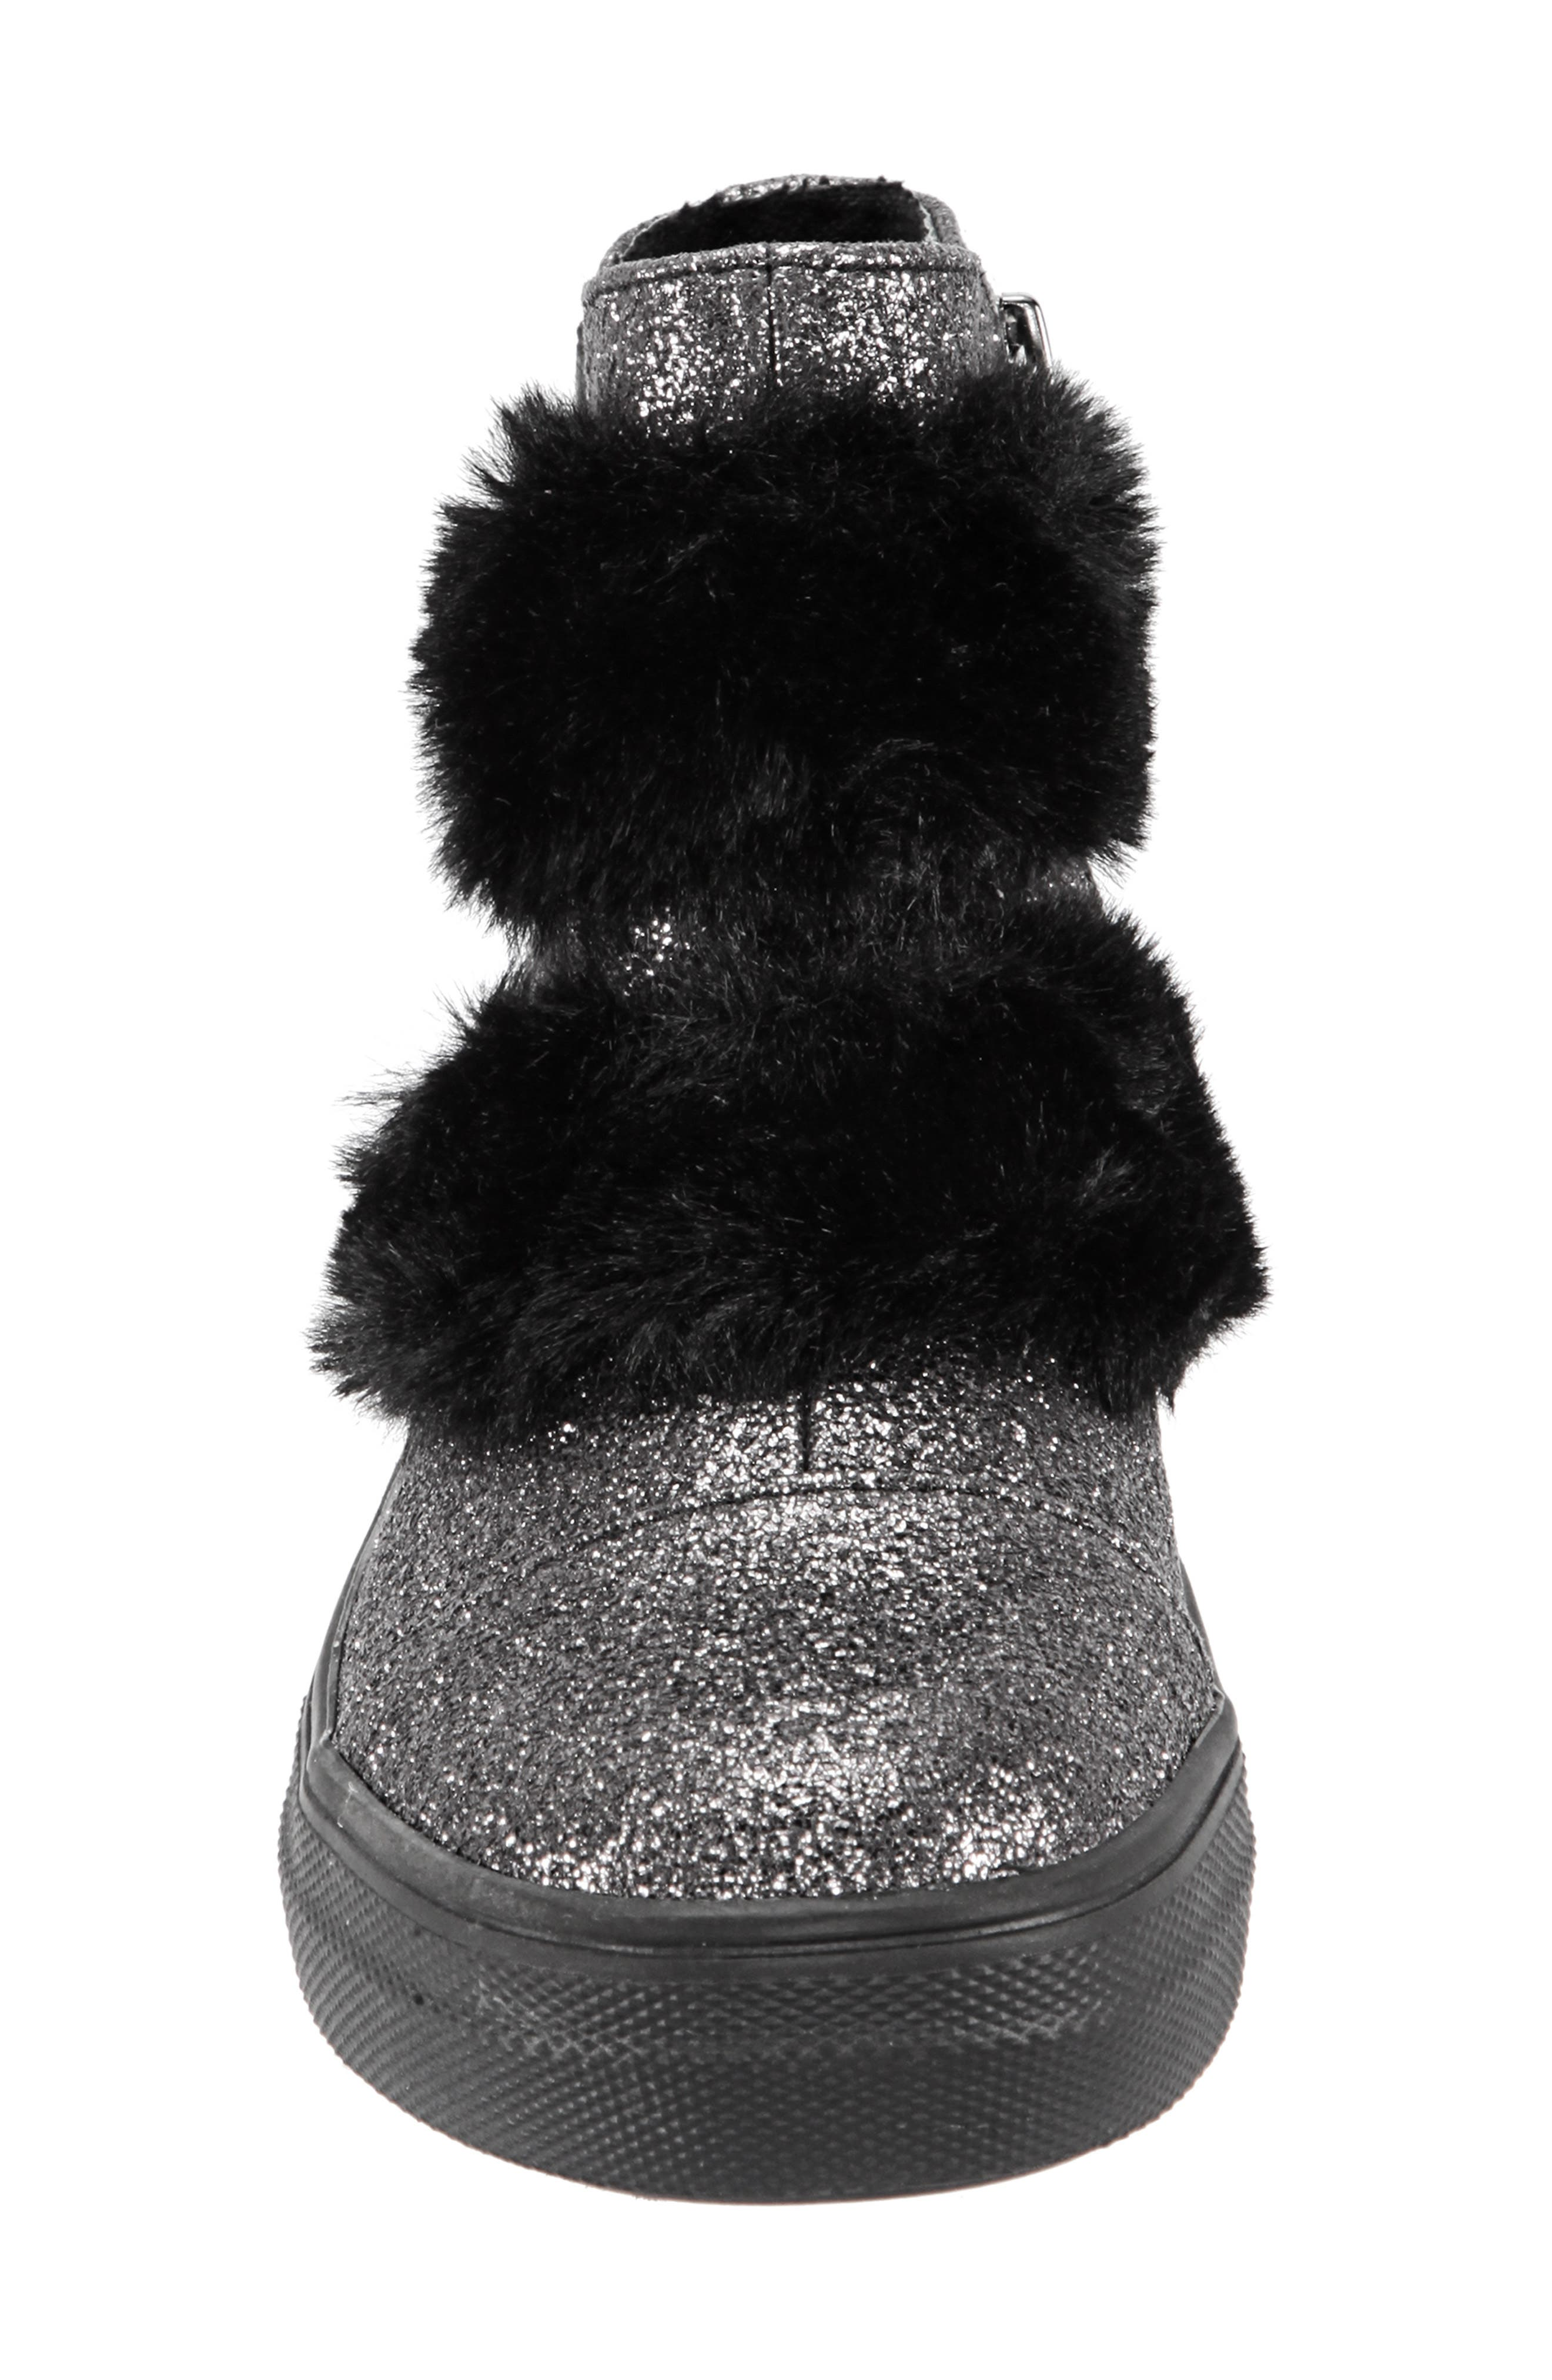 Helen Faux Fur Bootie Sneaker,                             Alternate thumbnail 4, color,                             PEWTER CRACKLE METALLIC